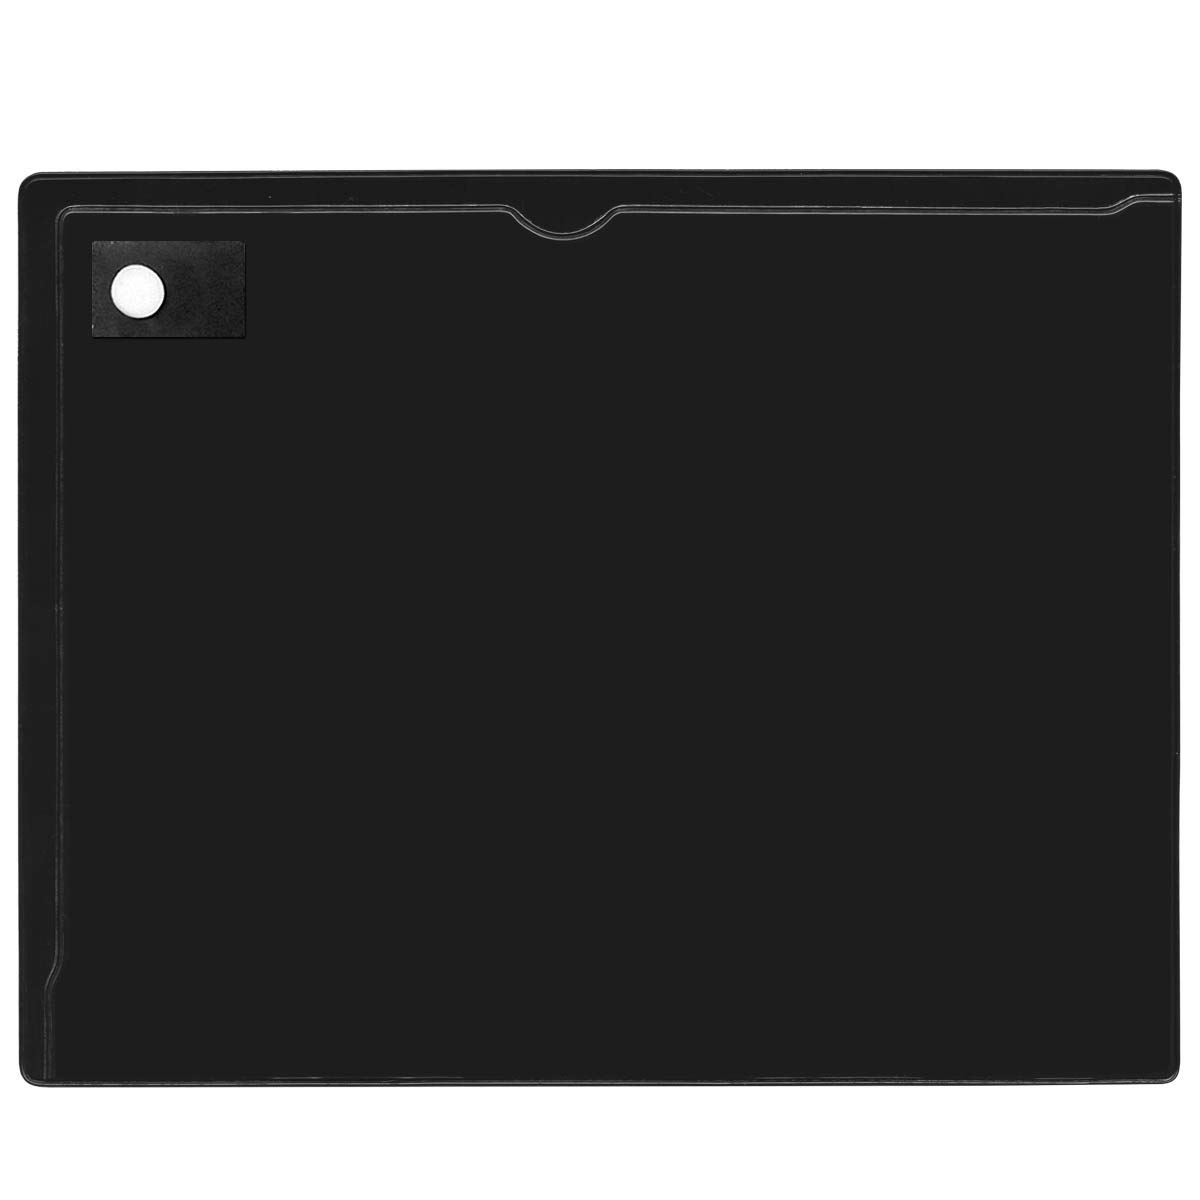 StoreSMART - Magnetic Closure Pocket - 10-Pack - Black - 8.5'' x 11'' (MCP8511P-PQBK-10)